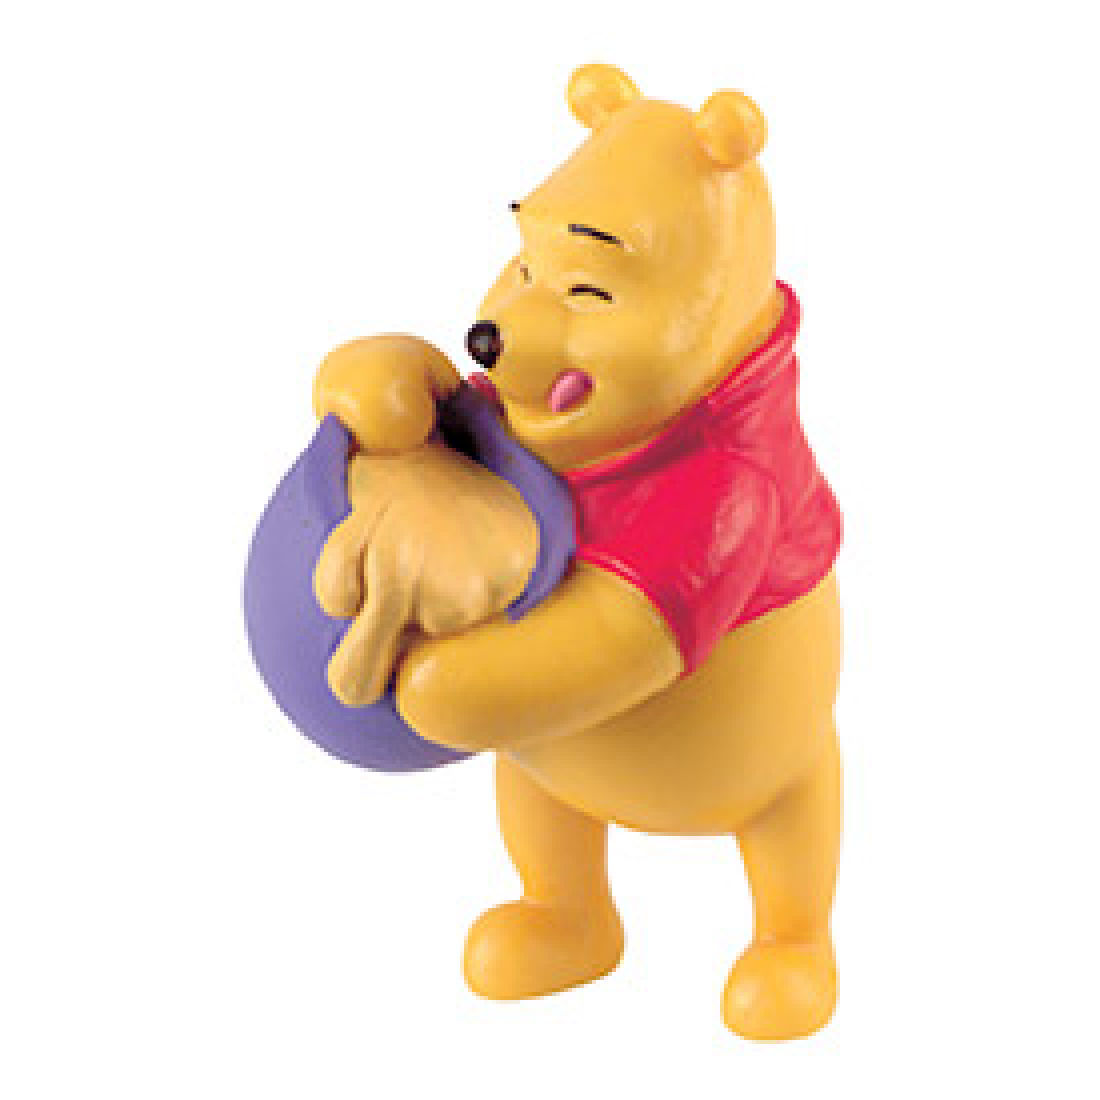 Disney Authentic EEYORE Figurine Cake TOPPER Figure Winnie the Pooh Toy NEW